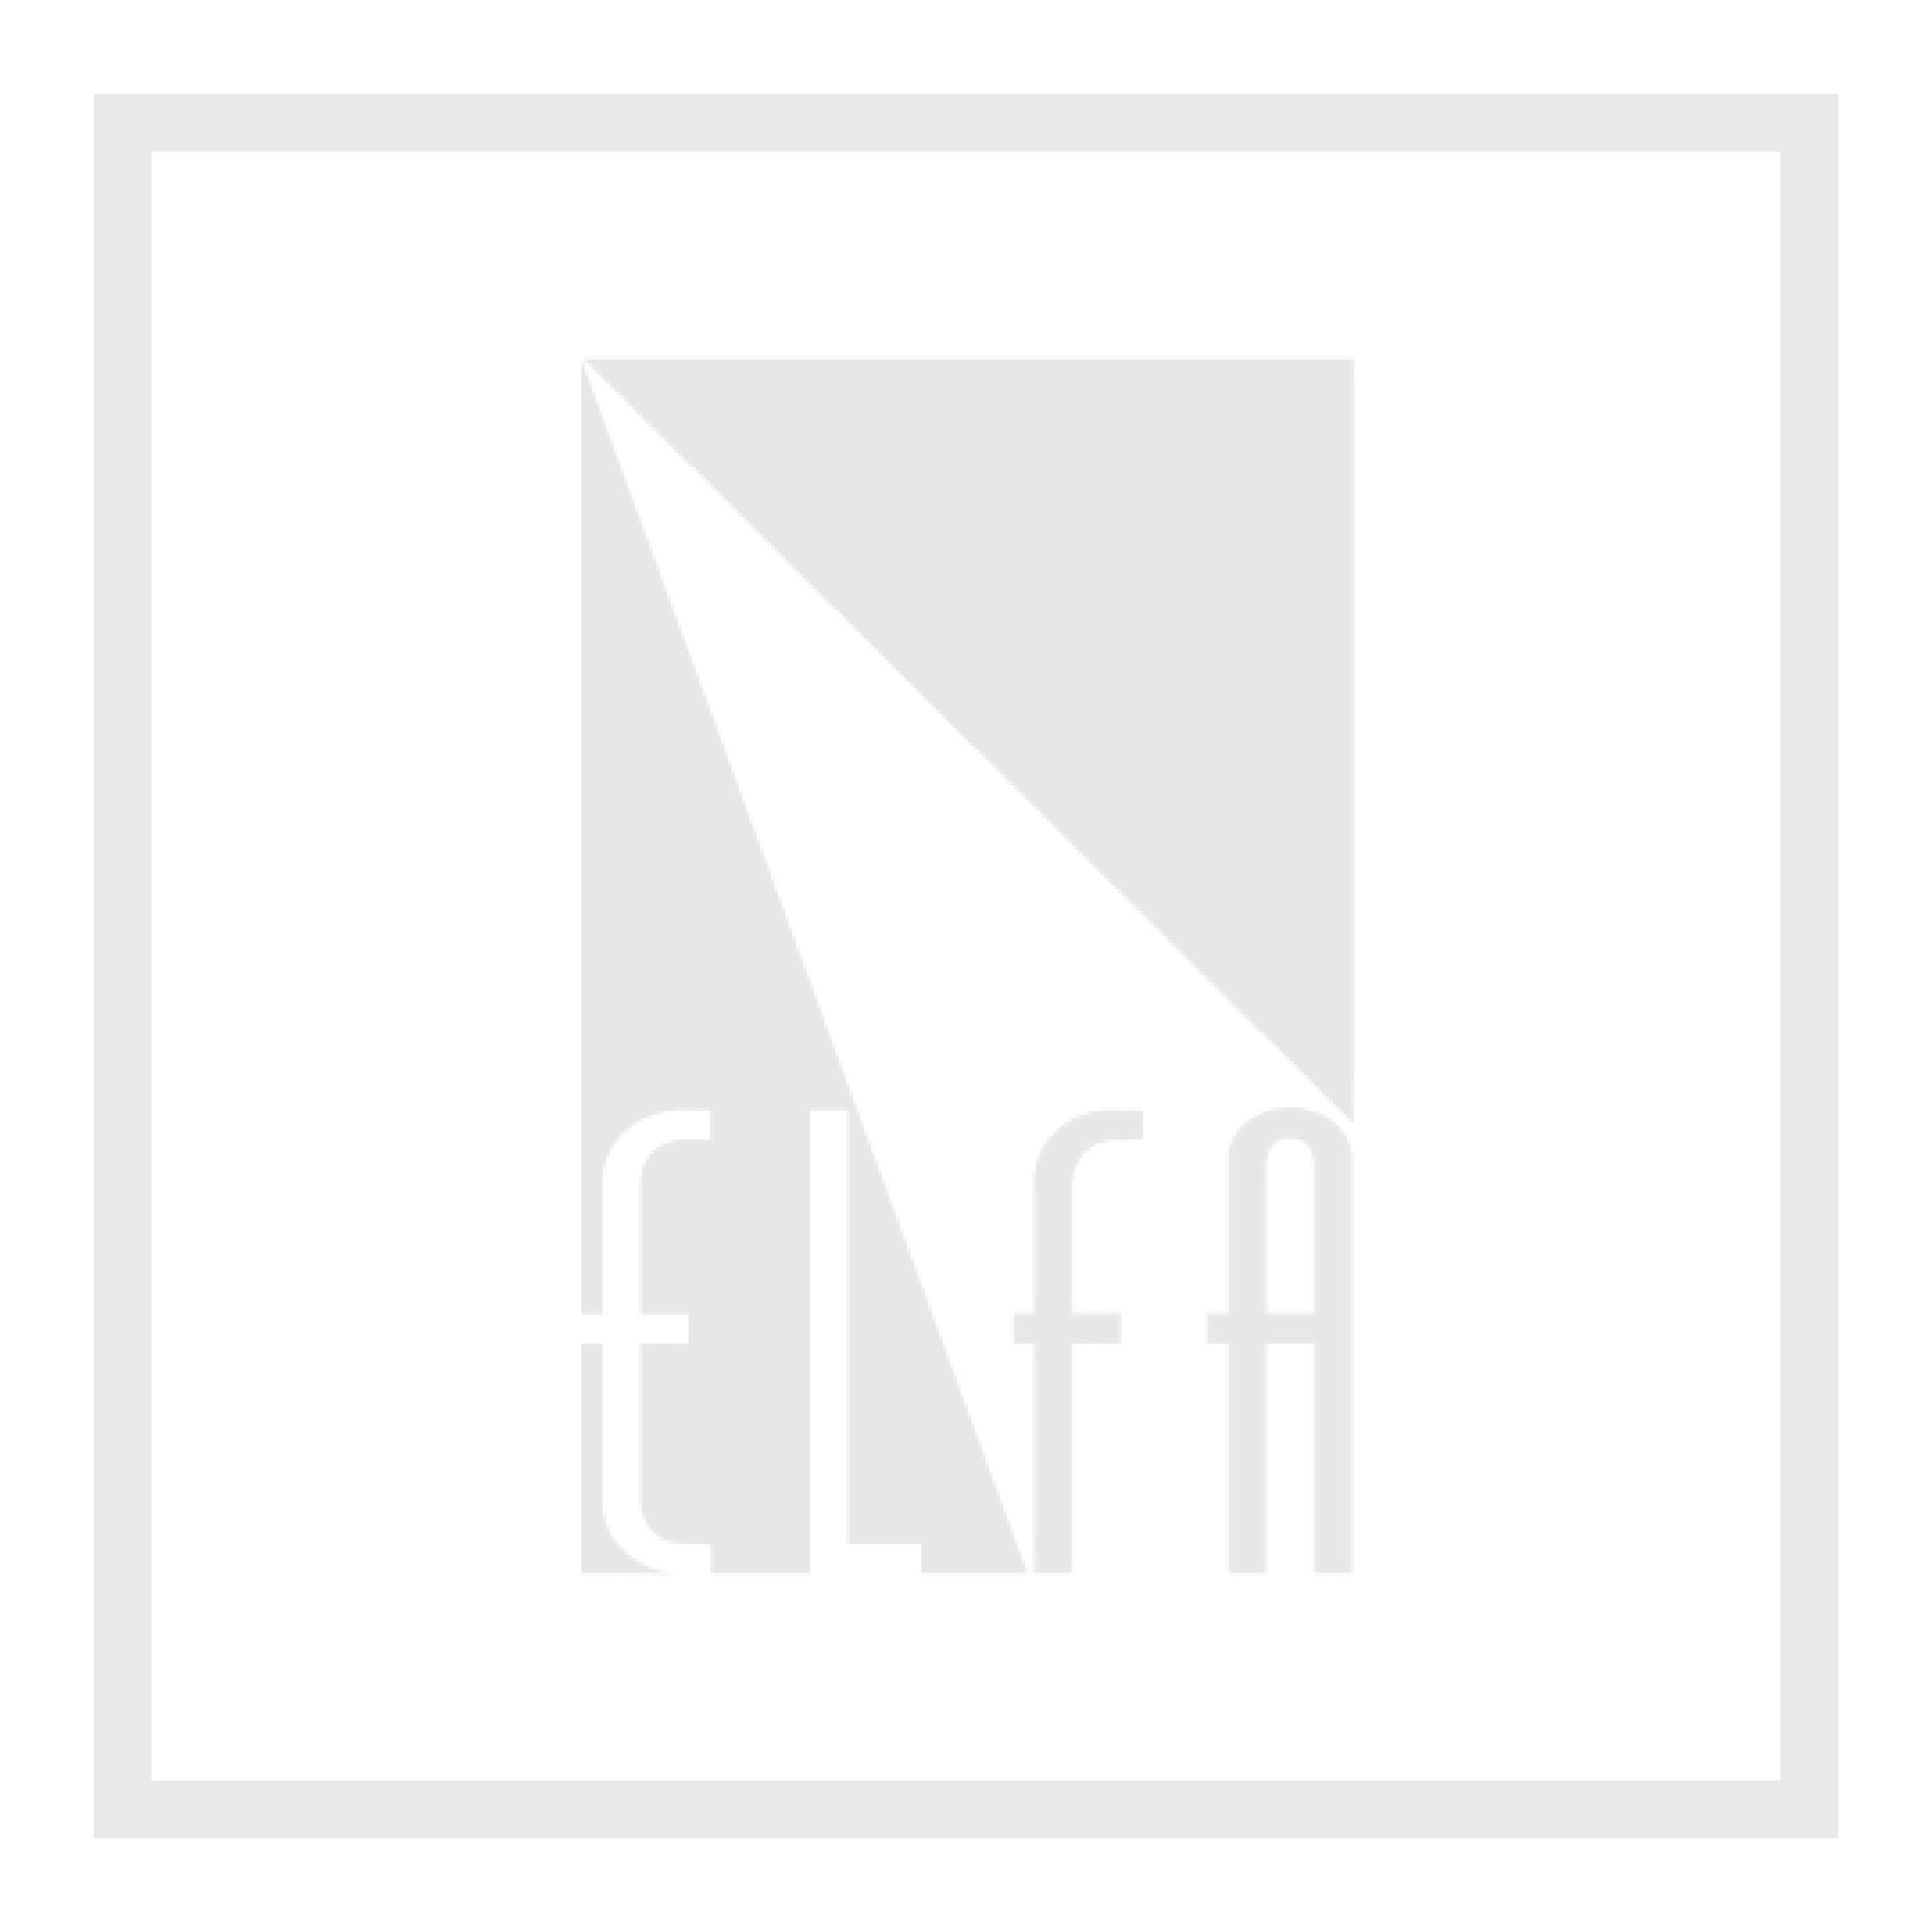 Renata Lithium coin CR2016SM MFR 2LF 2016SM